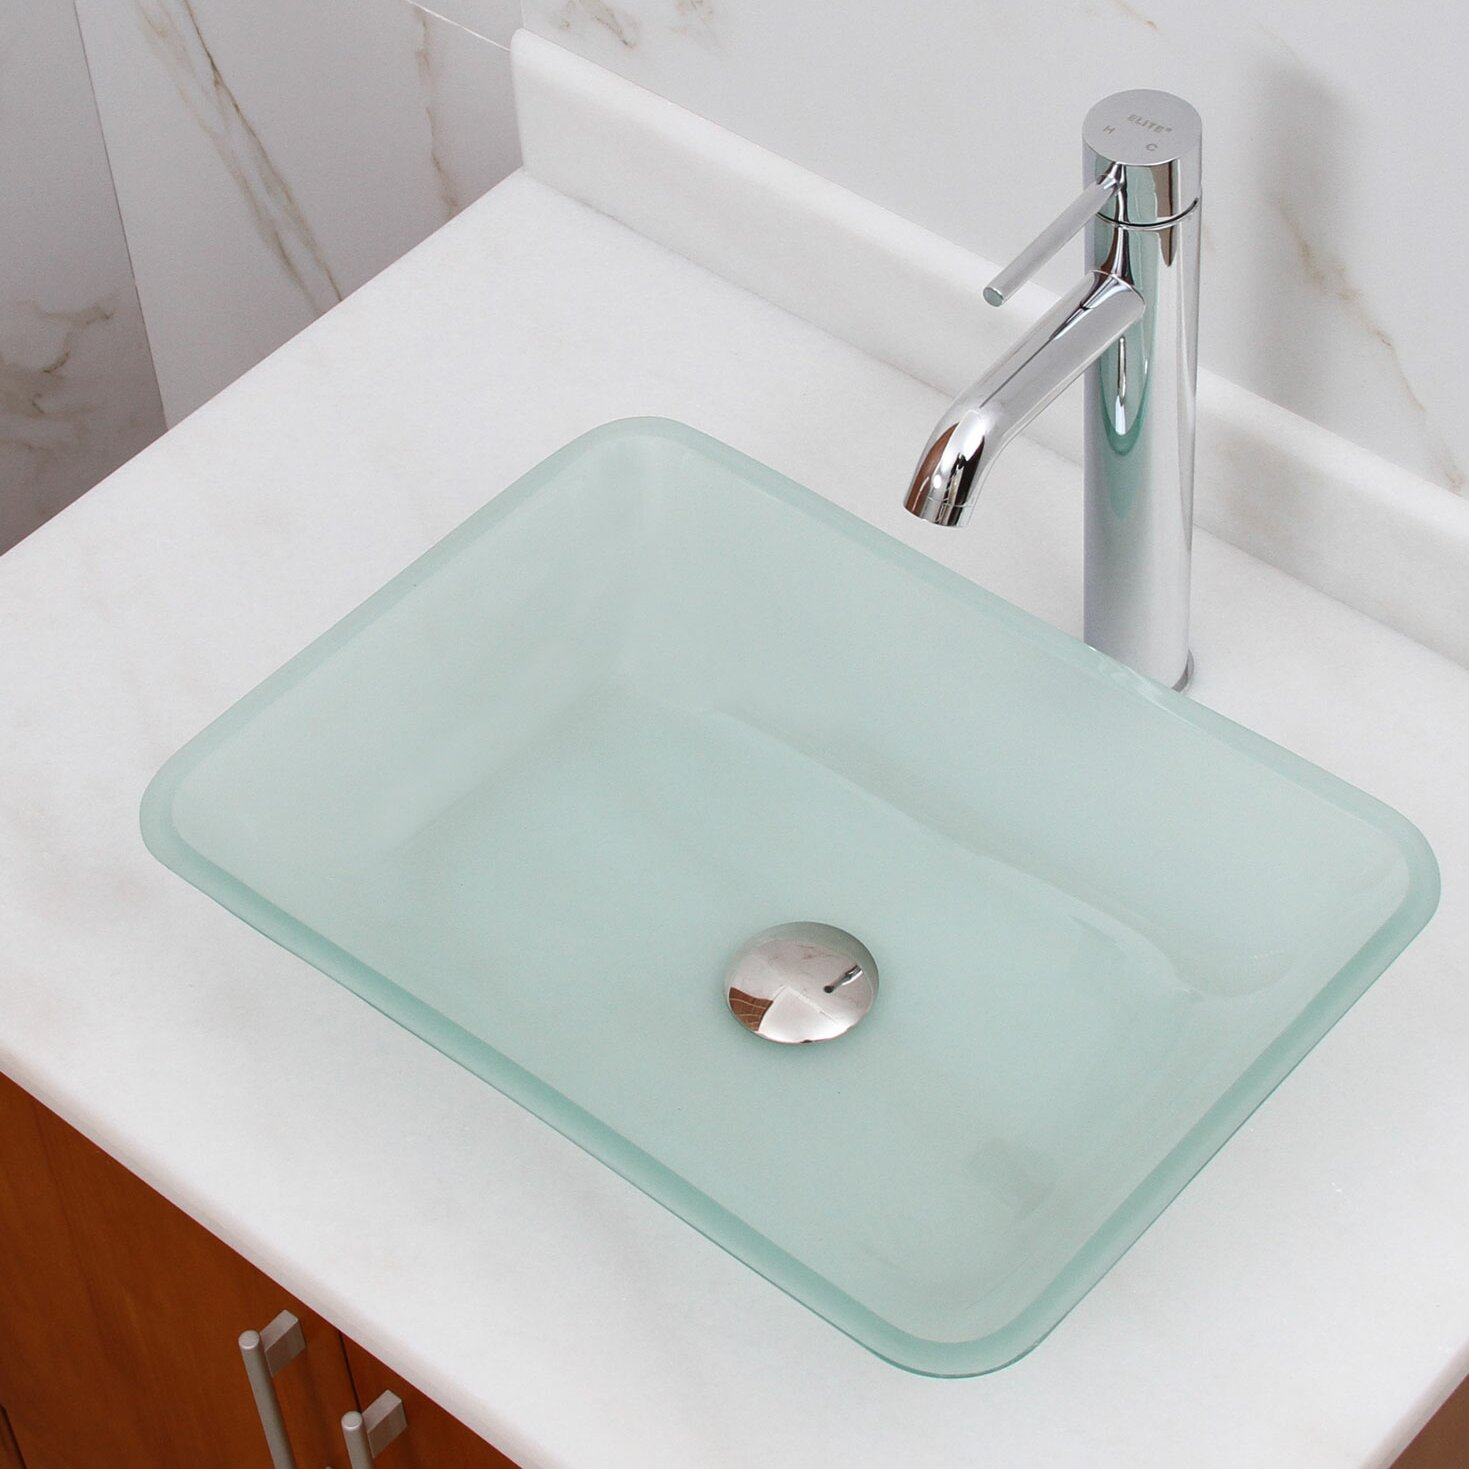 Elimaxs Elite Frosted Tempered Glass Rectangular Vessel Bathroom Sink Reviews Wayfair